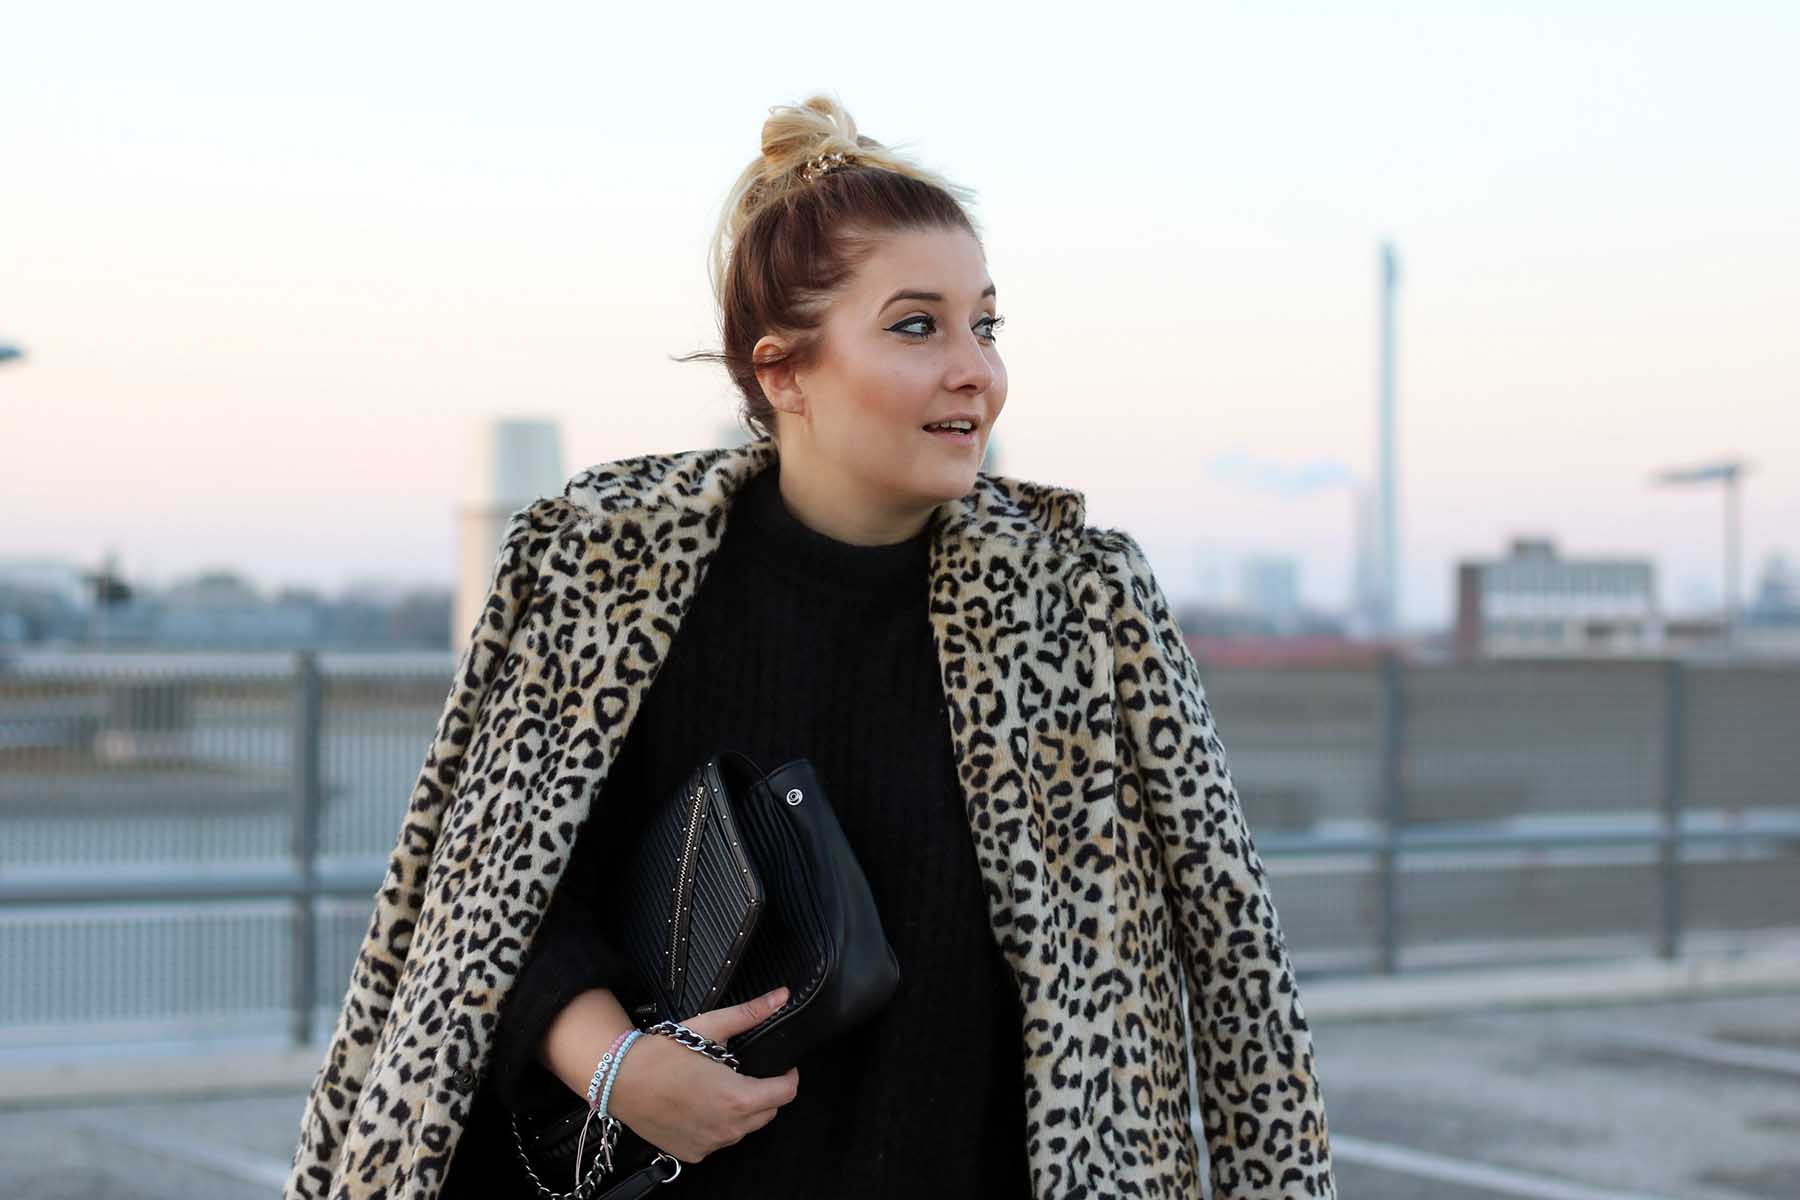 outift-leomantel-mantel-winter-leoparden-modeblog-fashionblog-look-braunschweig9